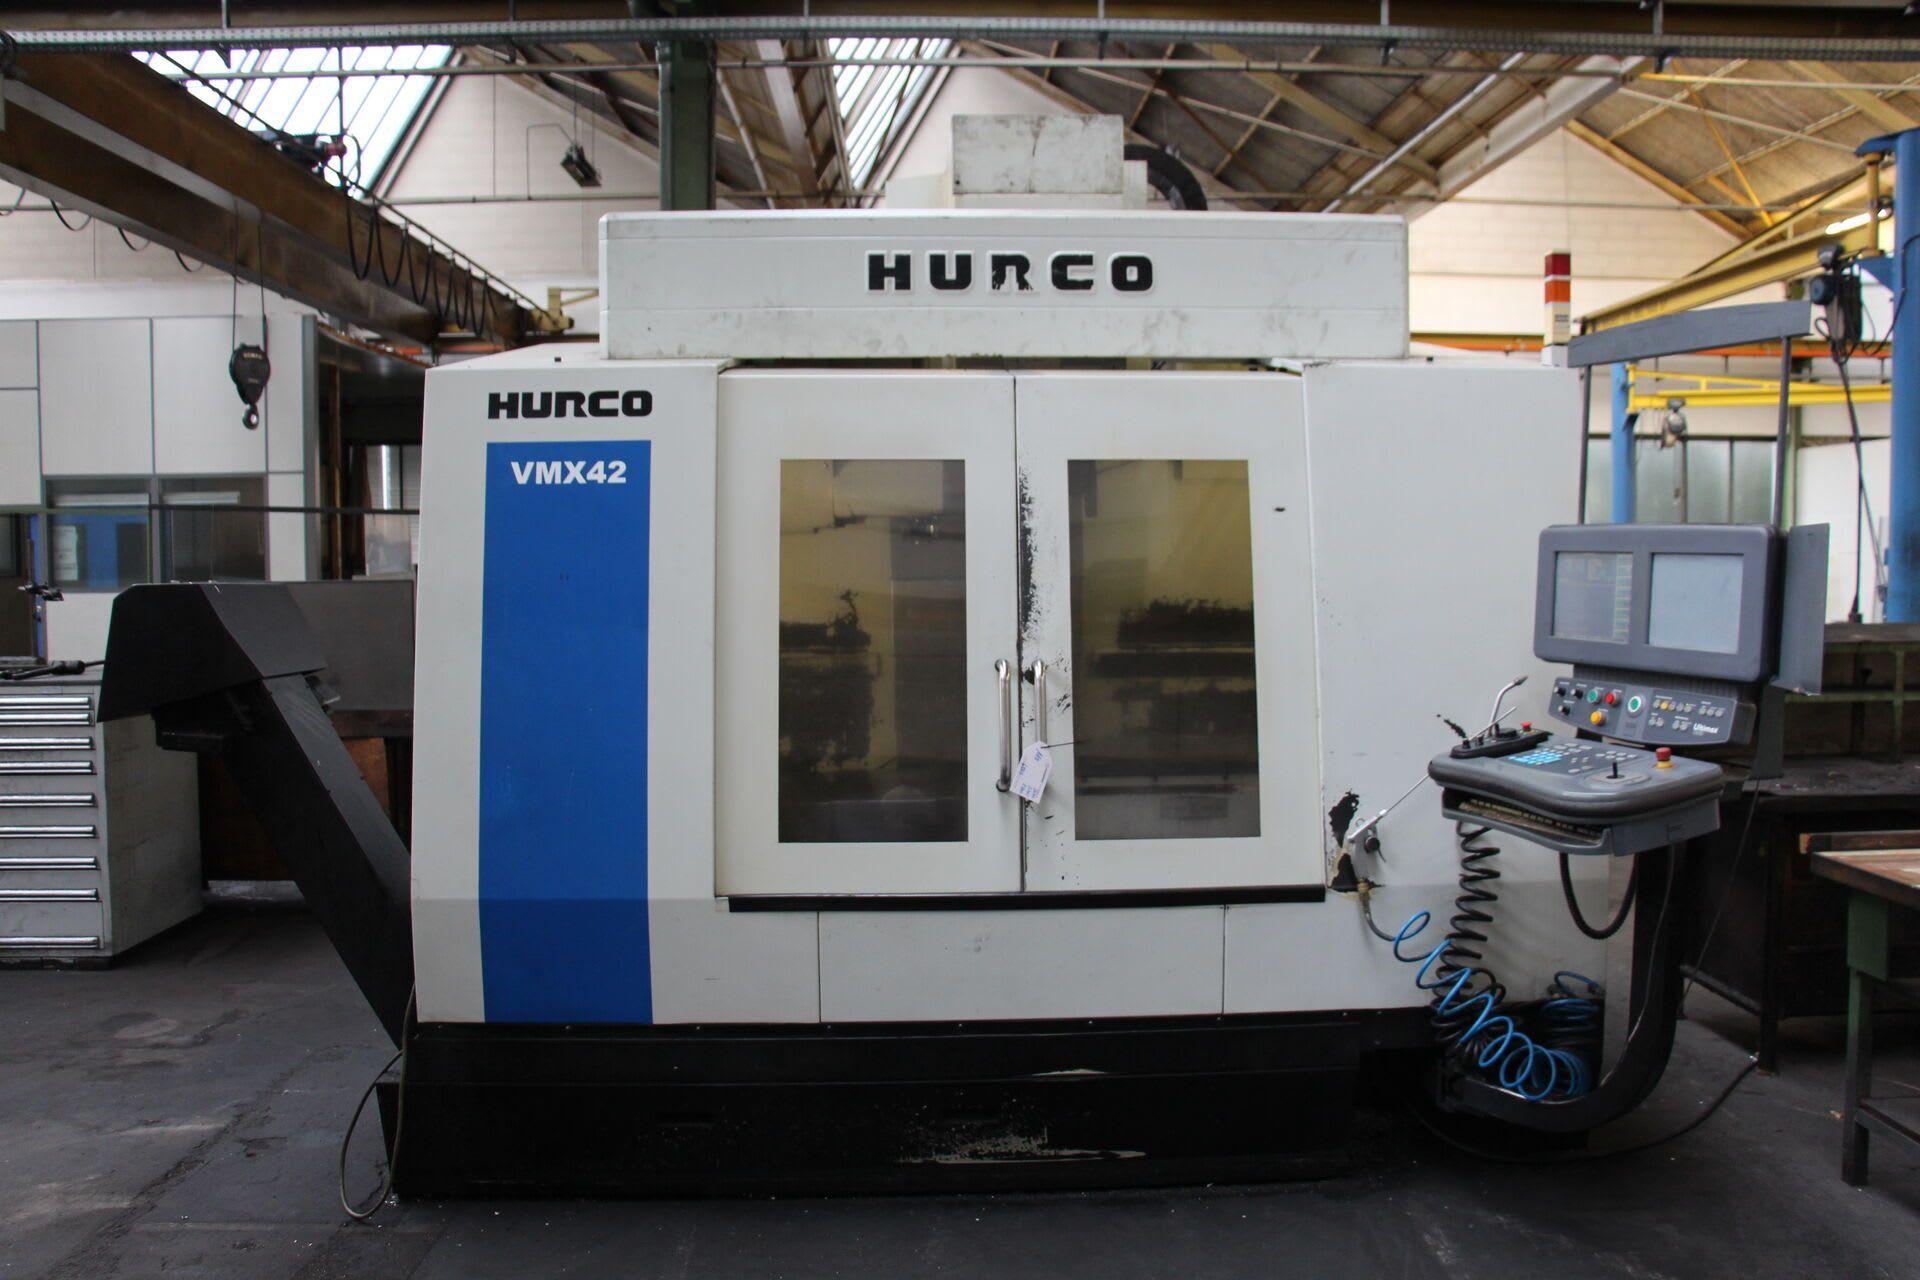 HURCO VMX 42 Vertikal-Bearbeitungszentrum